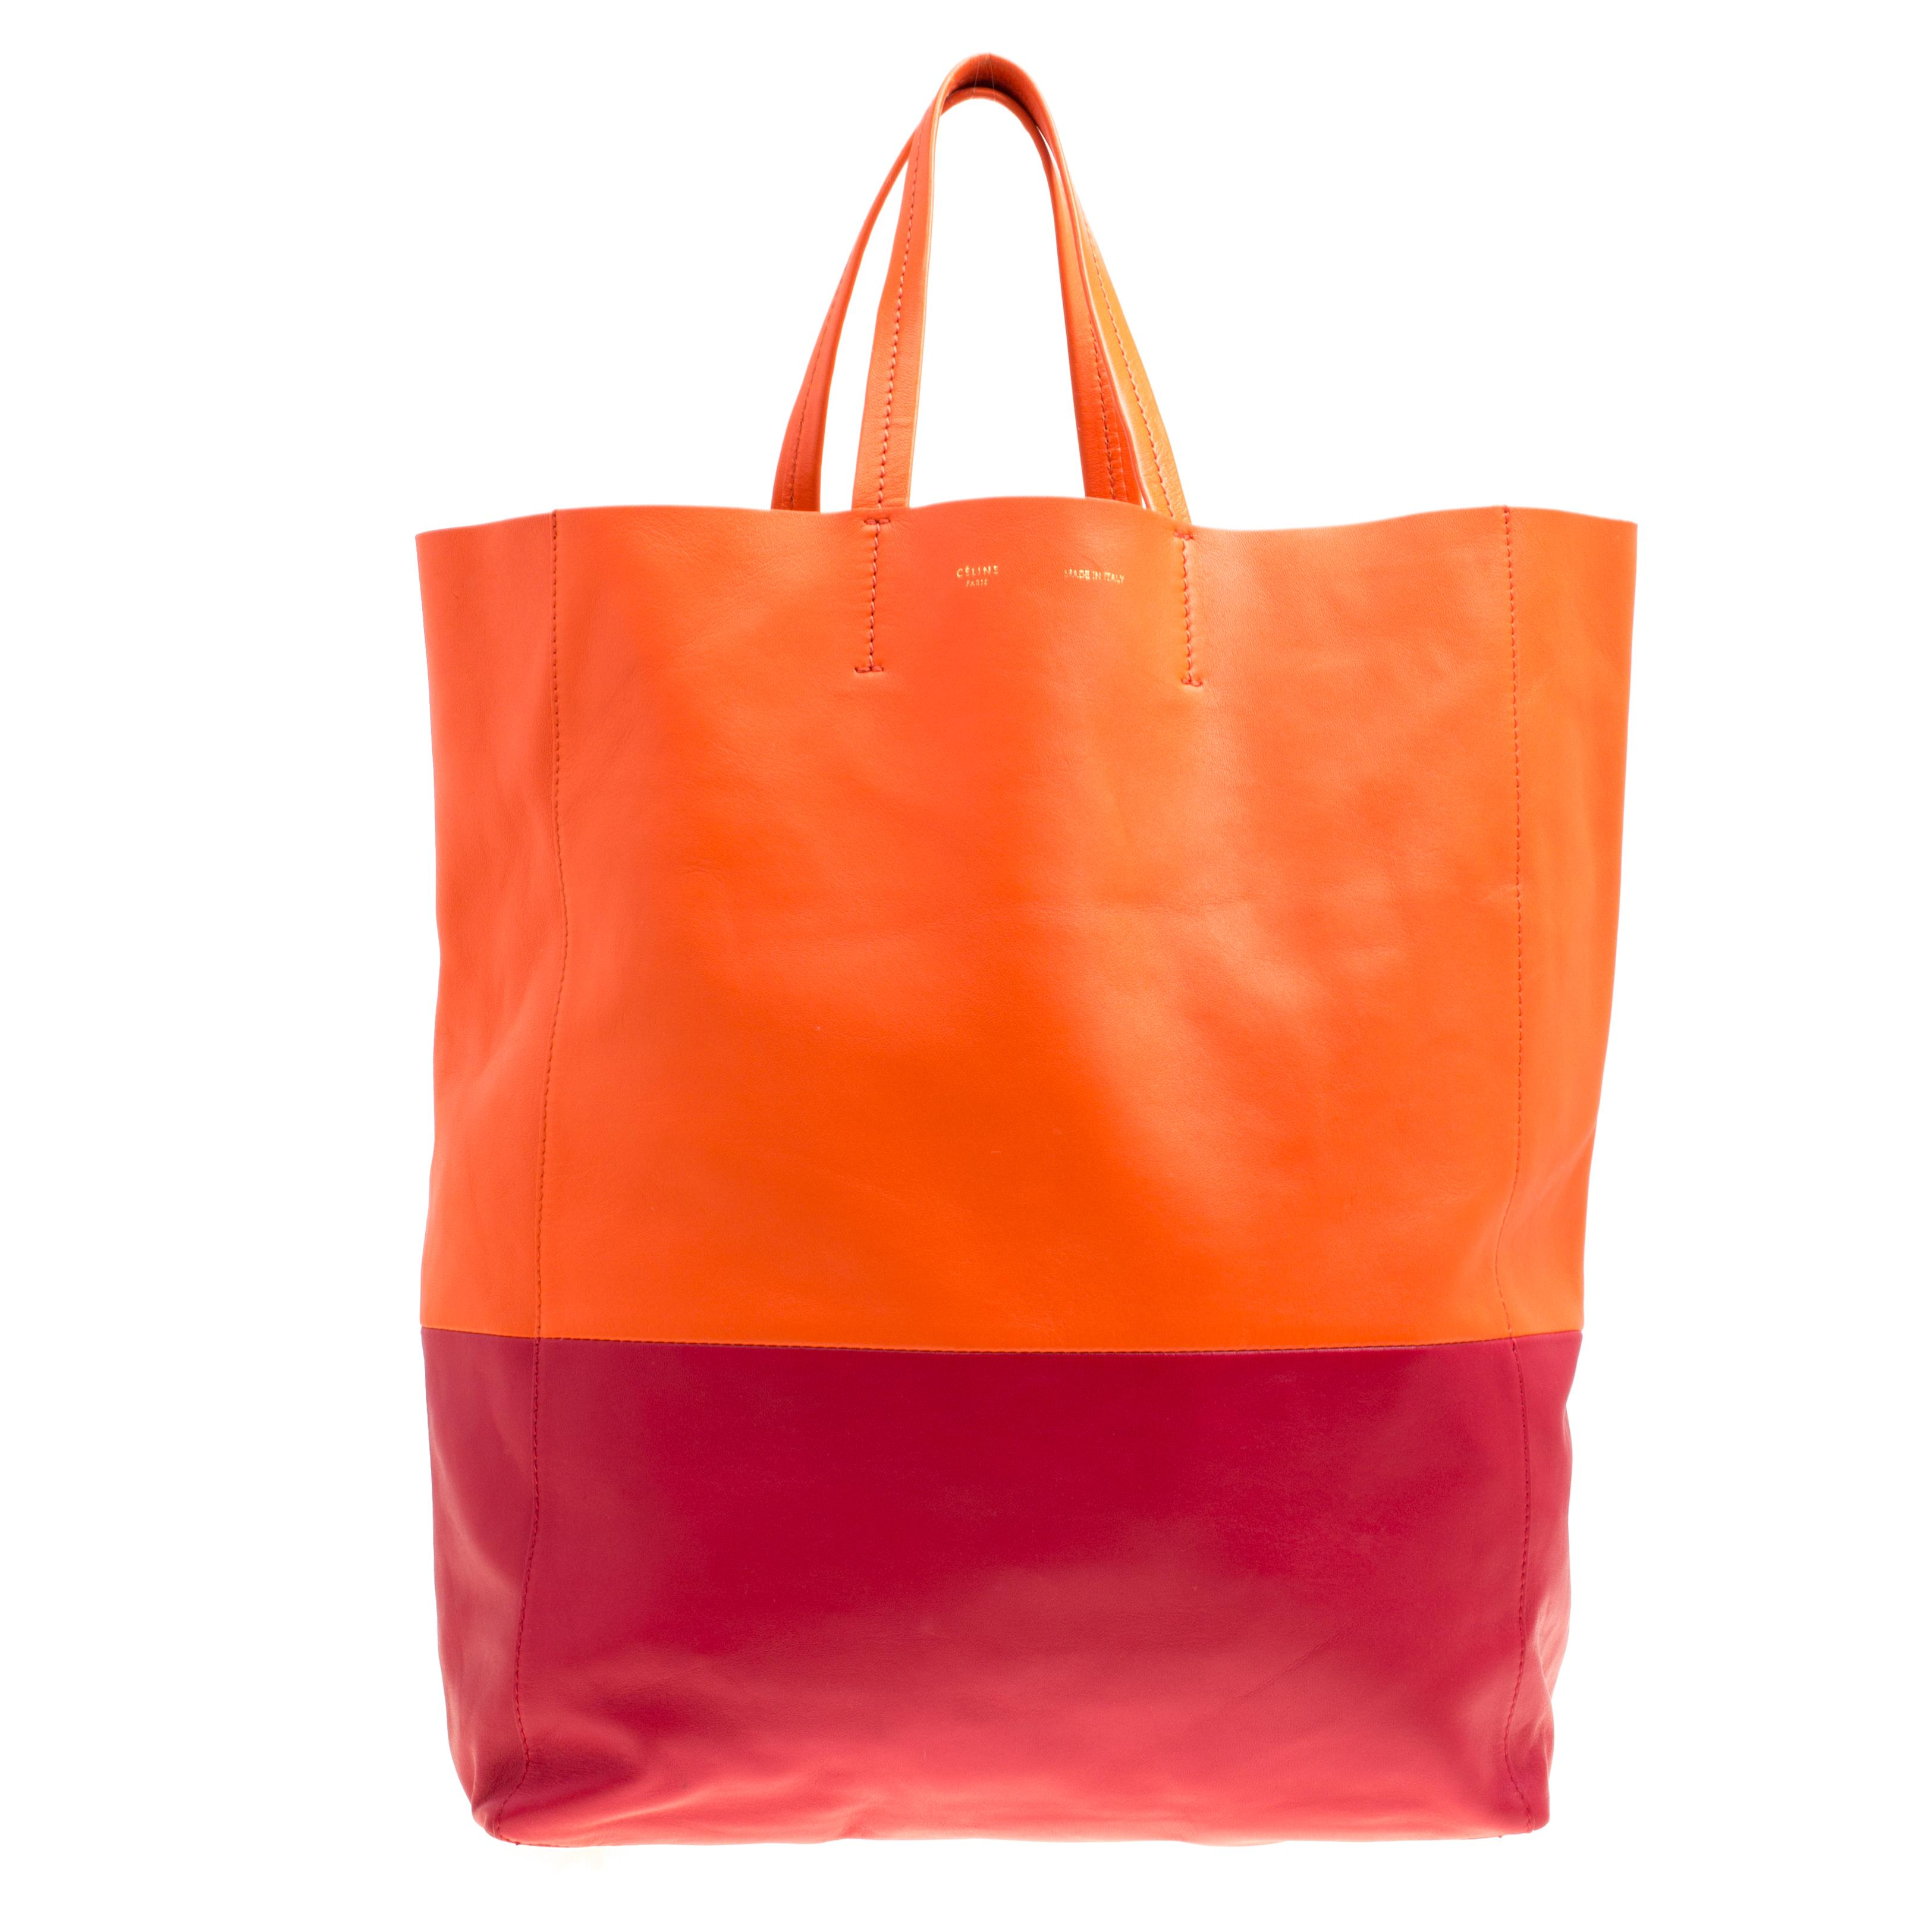 f018483d2d35 Lyst - Céline Orange red Leather Vertical Cabas Tote in Orange